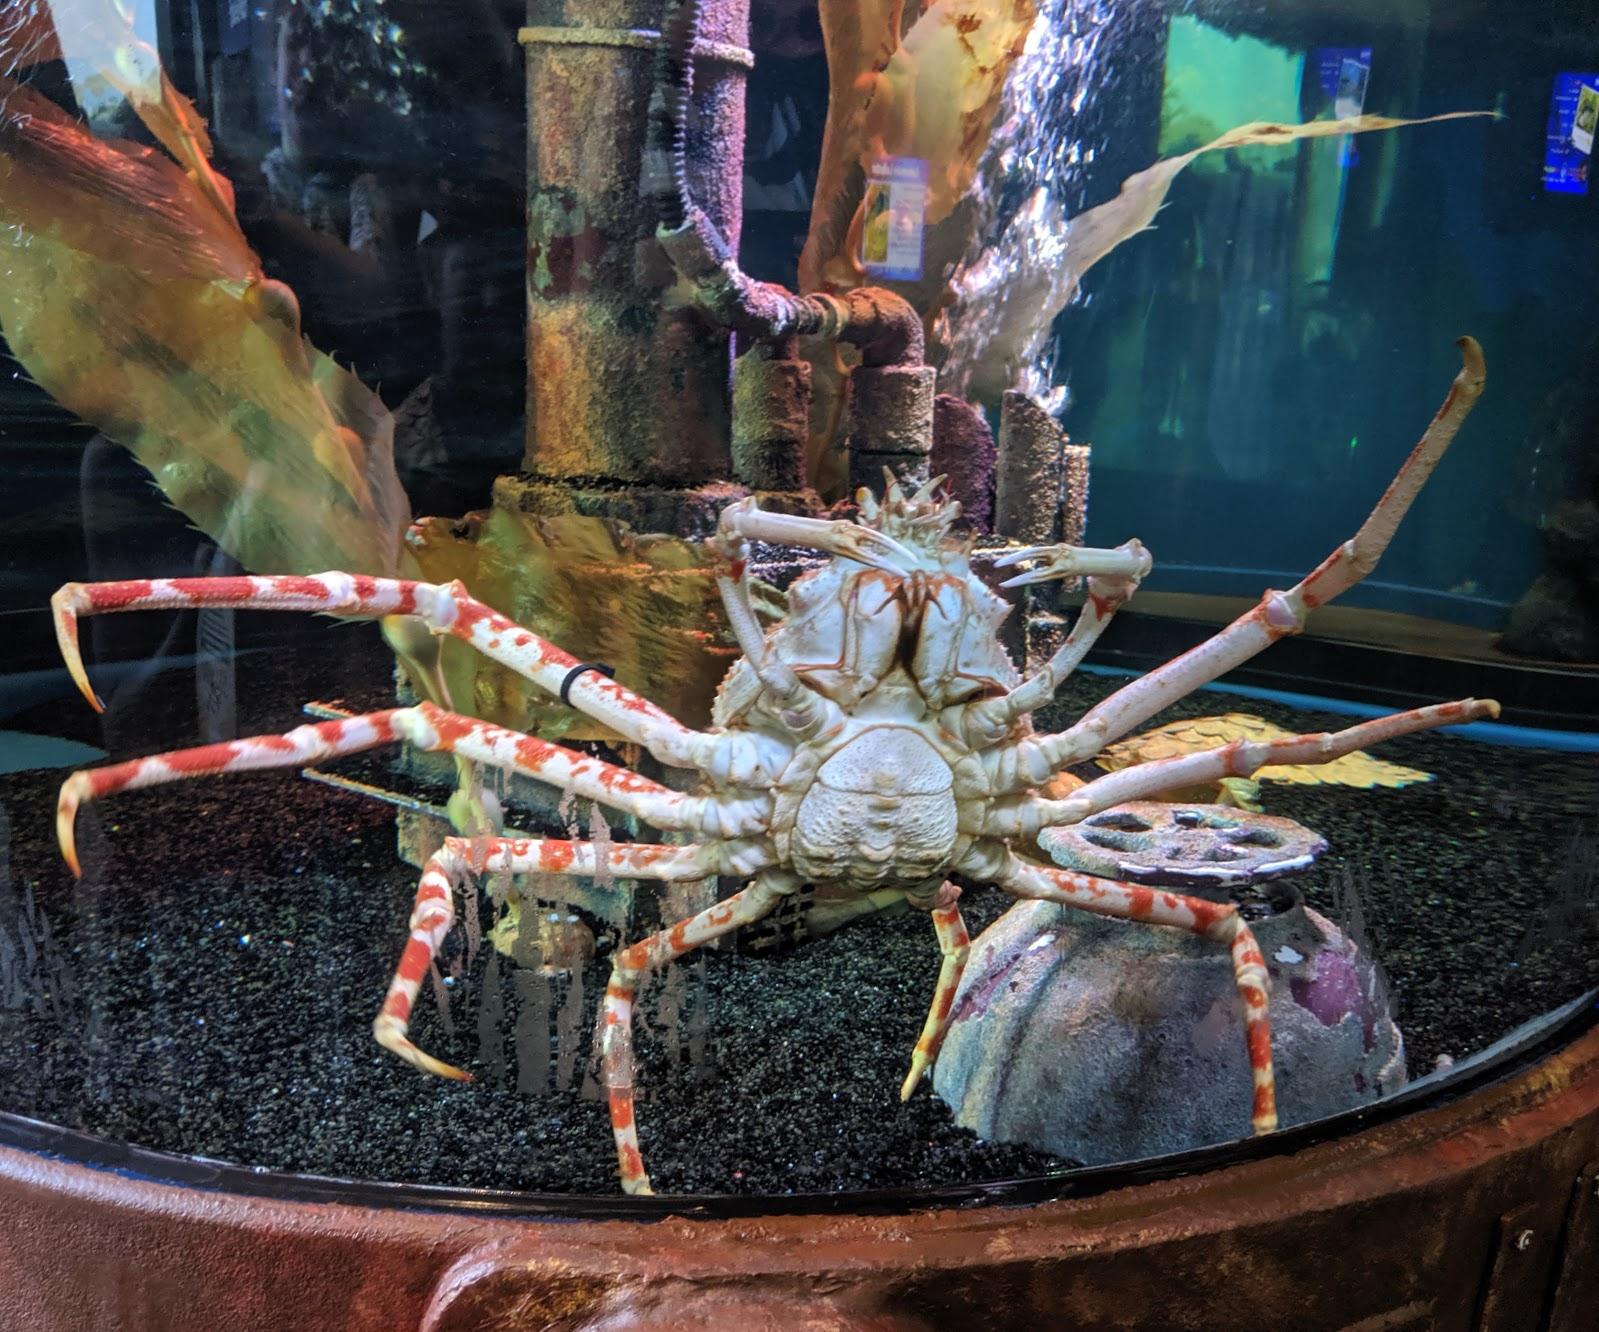 The Best Sea Life Aquariums in the UK  - Sea Life Loch Lomond